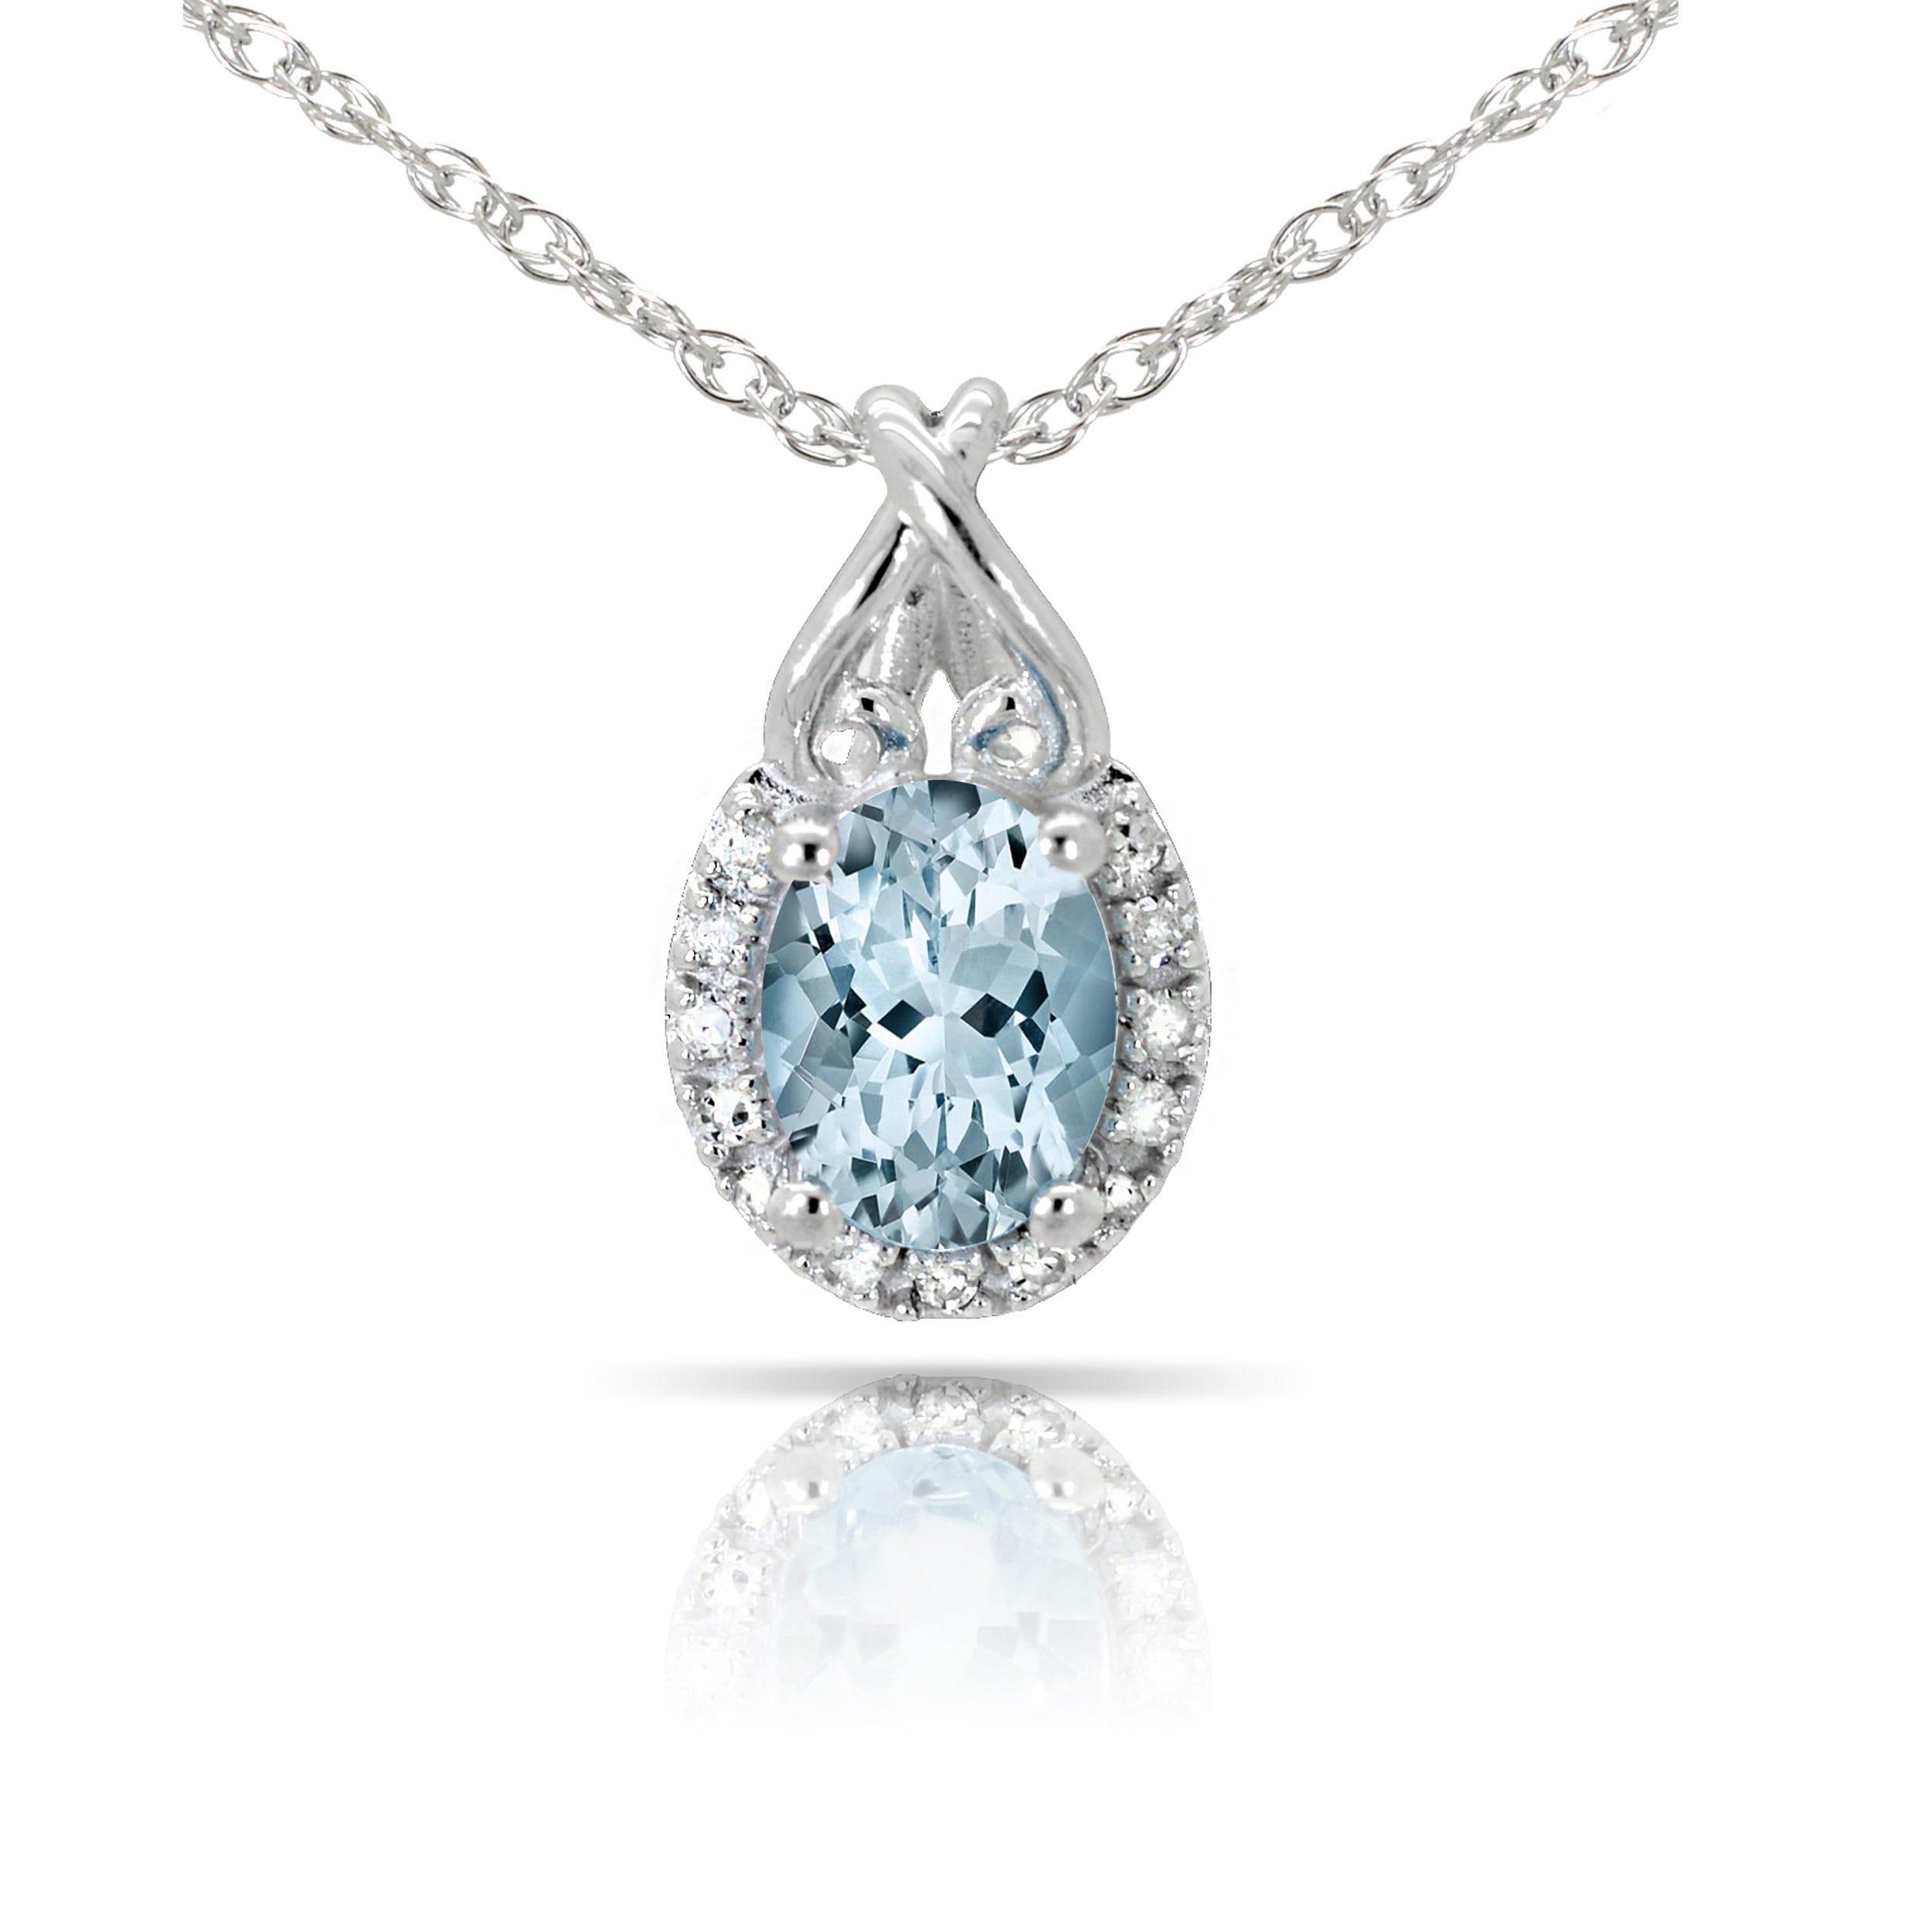 Aquamarine & Diamond Oval Heart Pendant in 10k White Gold